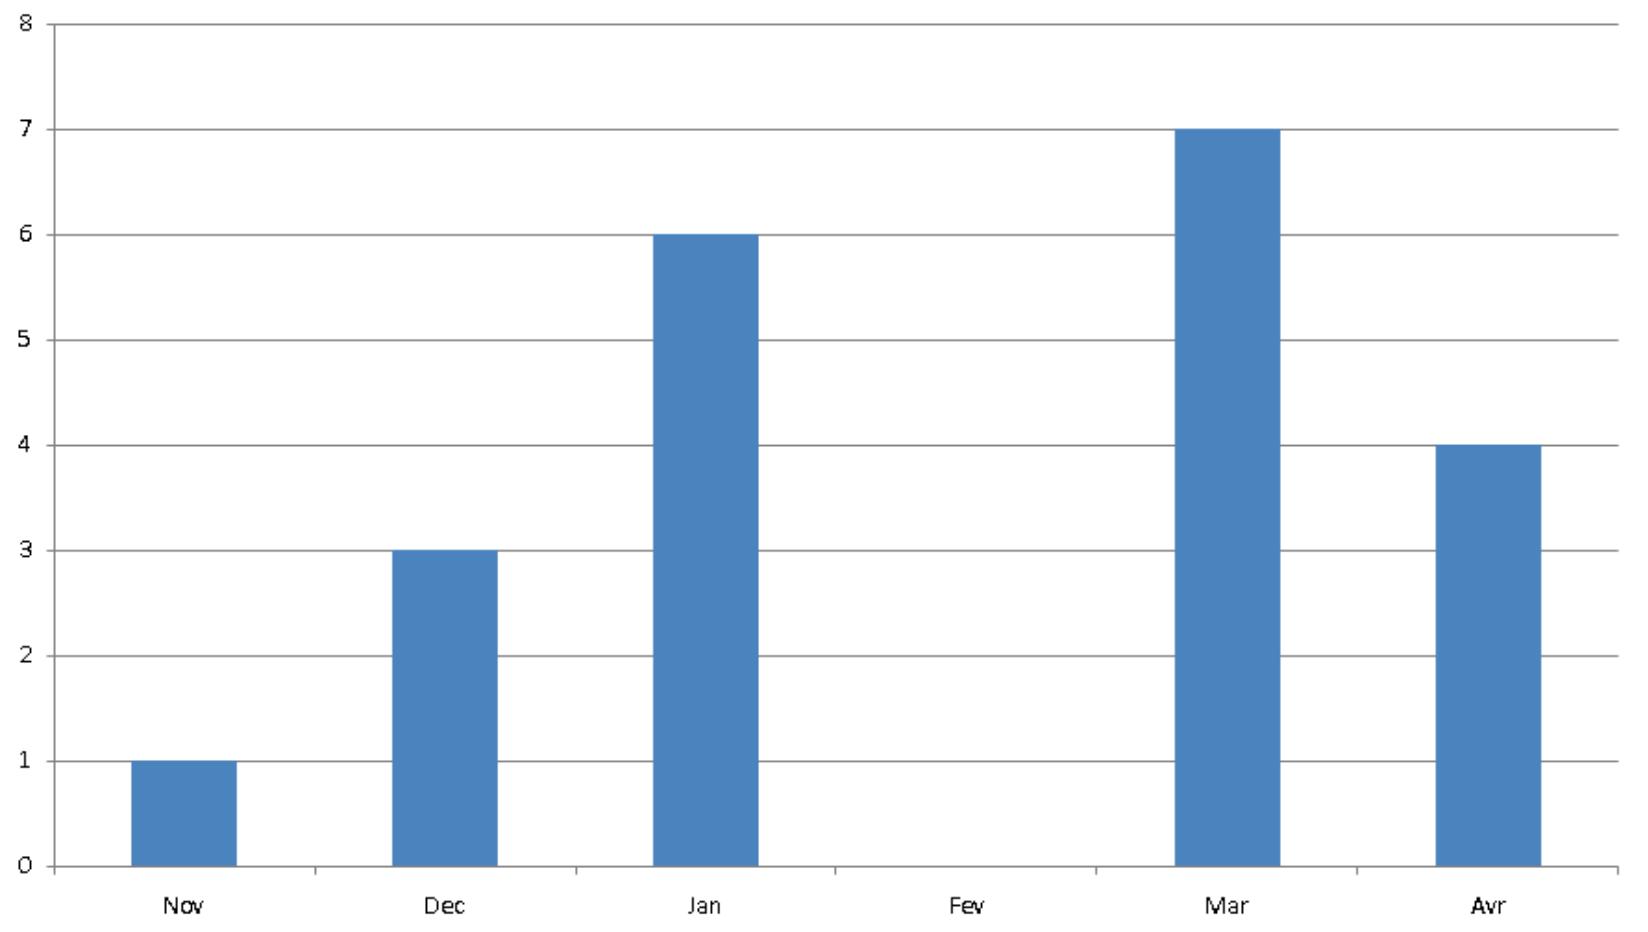 nombre de cyclone tres intense par mois